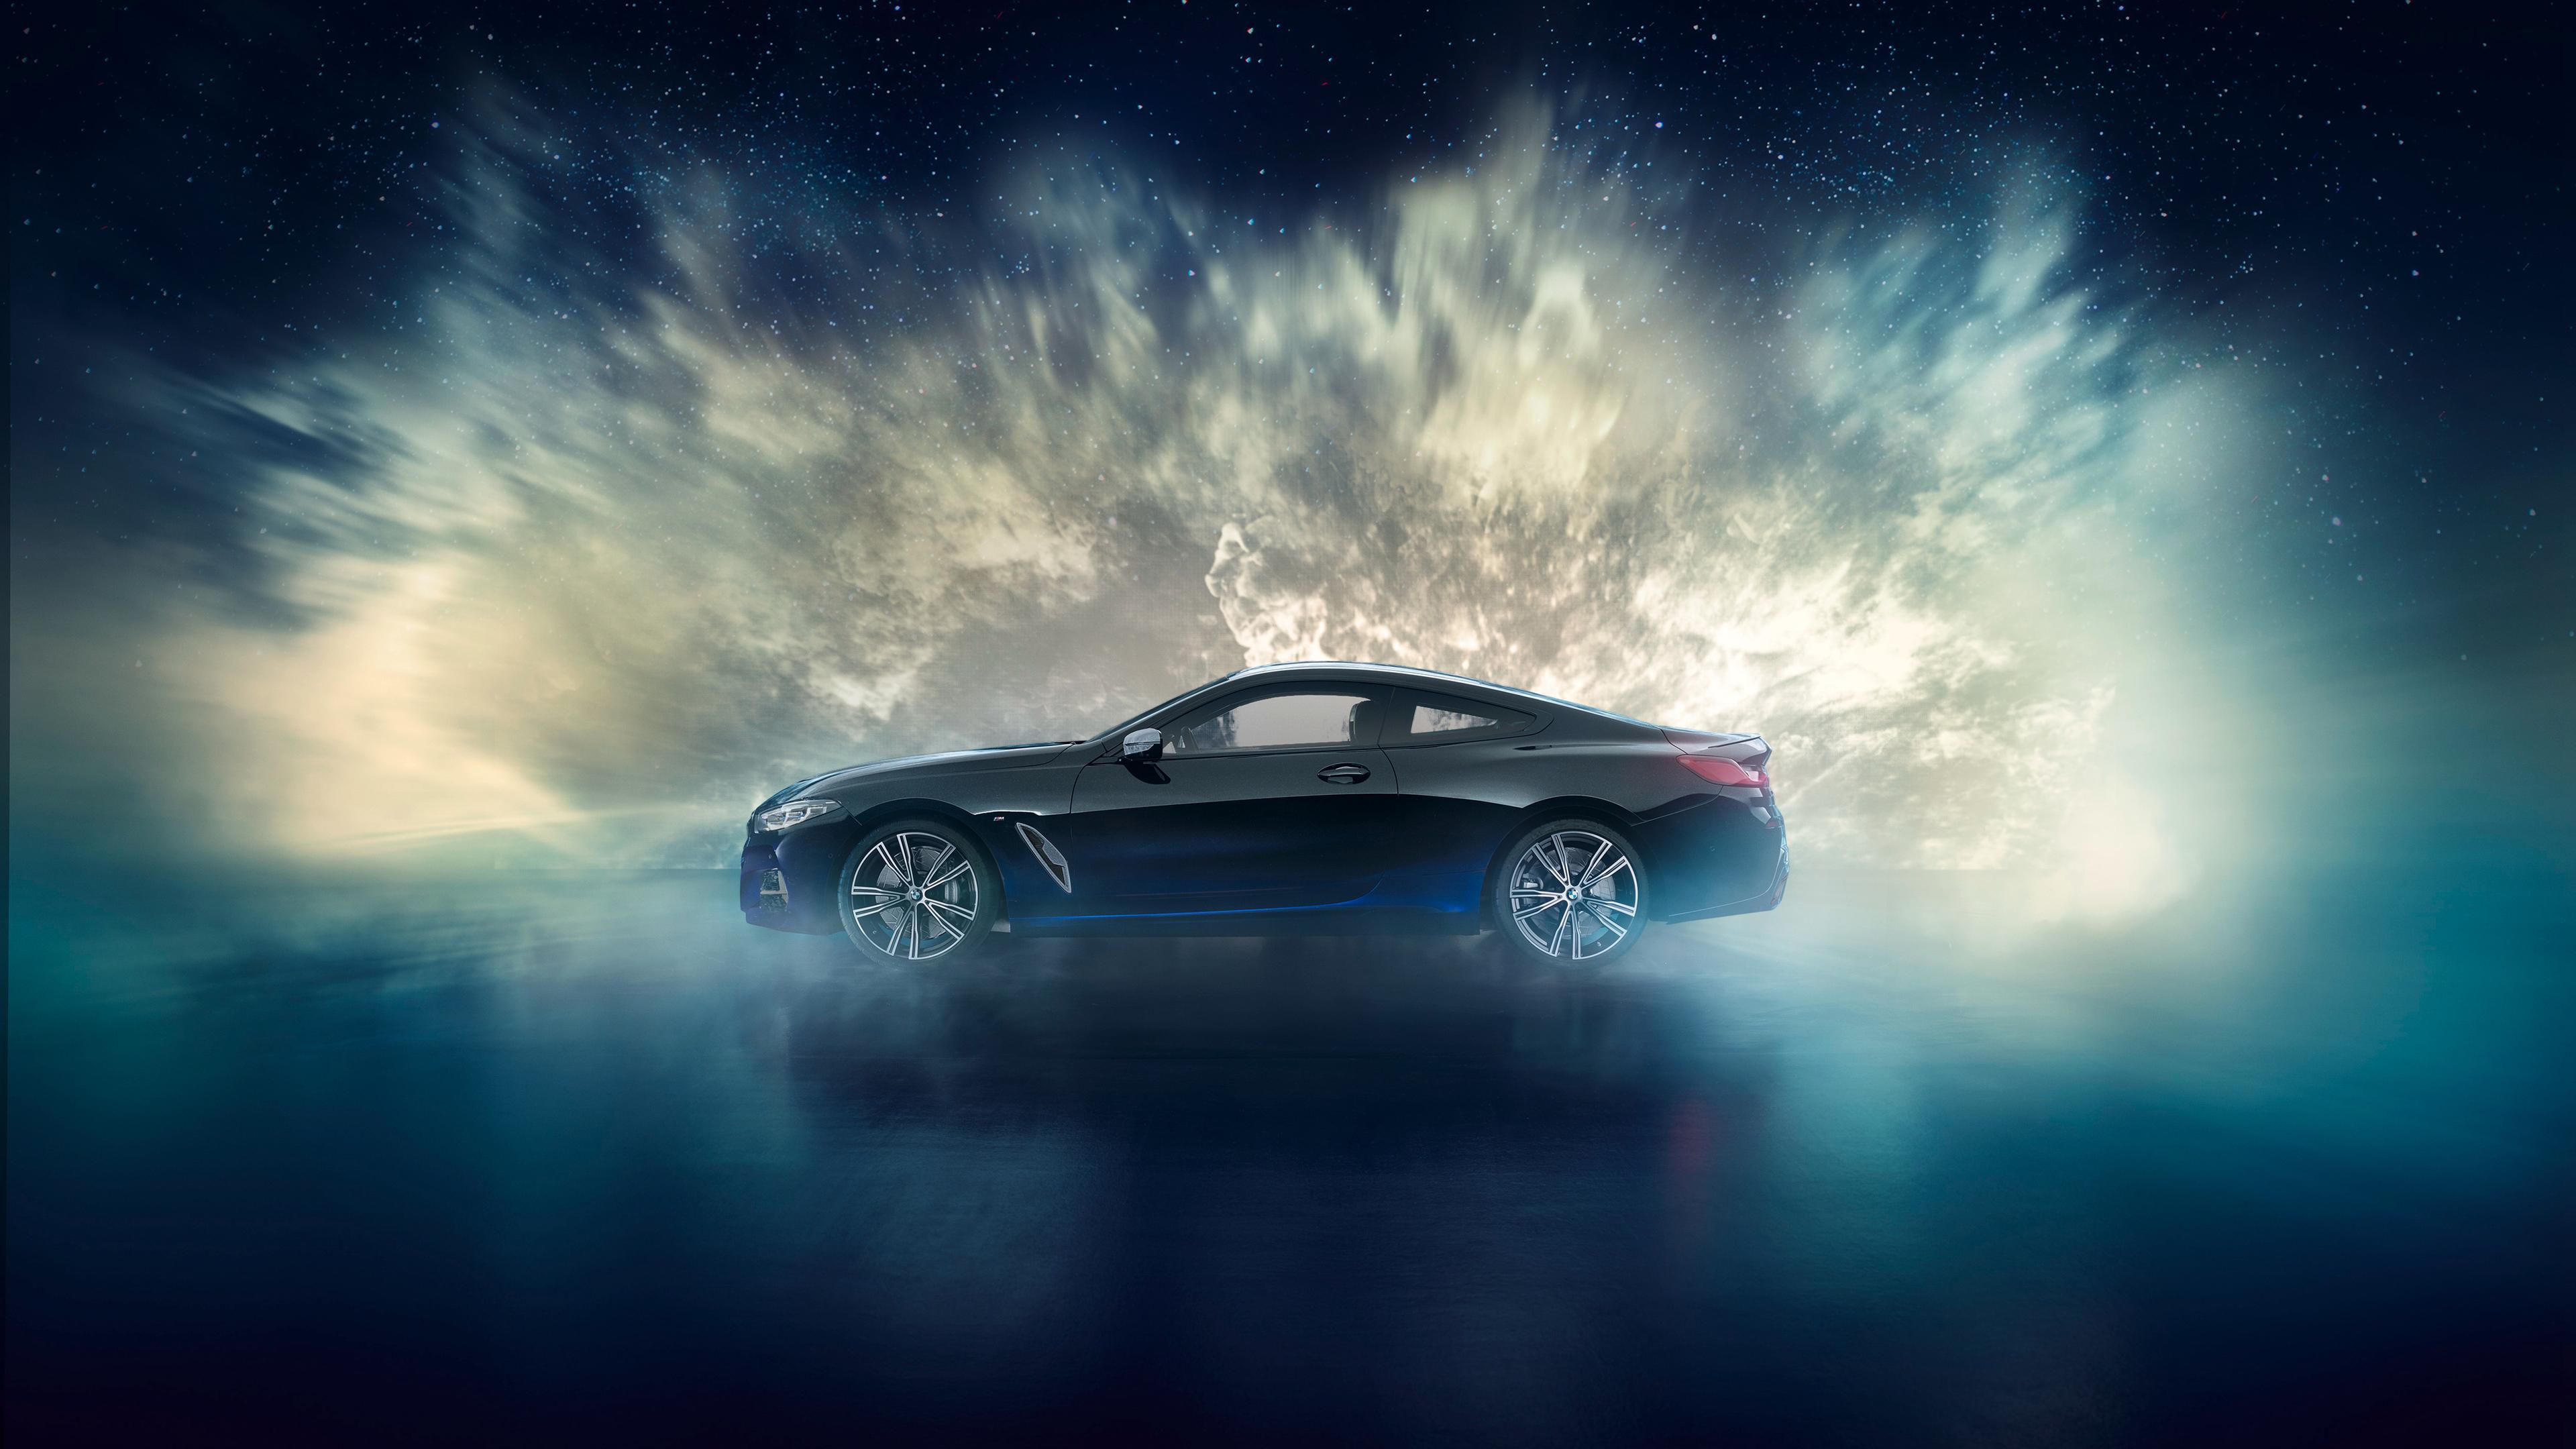 bmw individual m850i xdrive night sky 2019 new 4k 1547936924 - BMW Individual M850i XDrive Night Sky 2019 New 4k - hd-wallpapers, cars wallpapers, bmw wallpapers, 4k-wallpapers, 2019 cars wallpapers